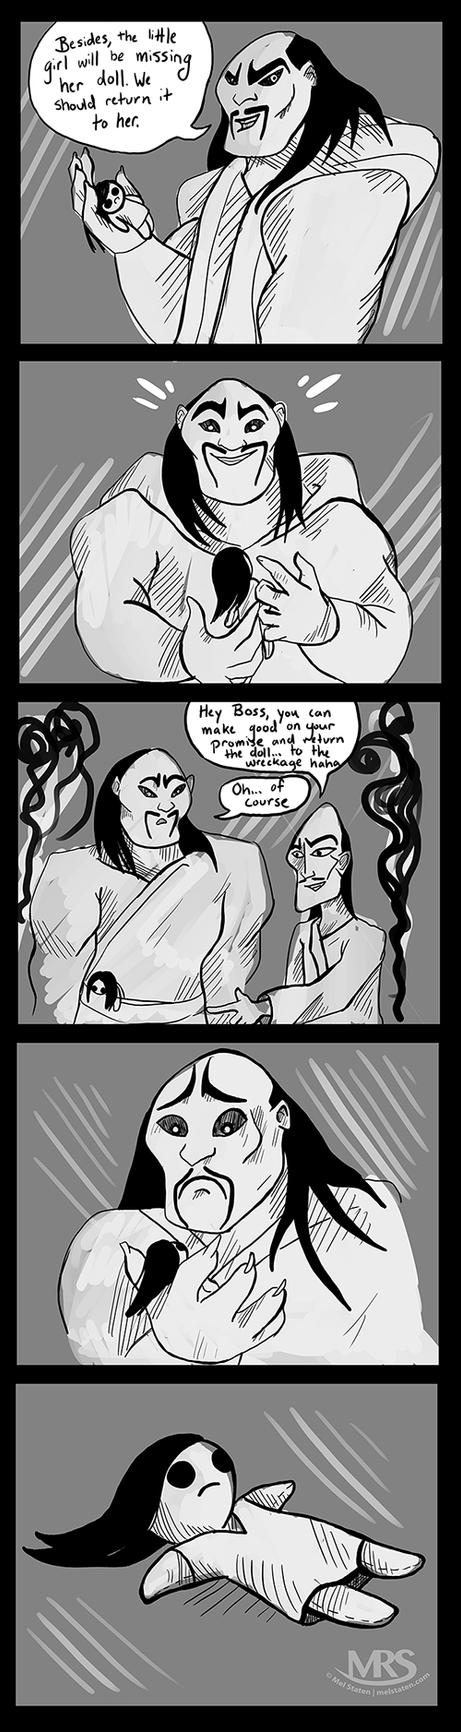 Mulan-comic by Melaninny